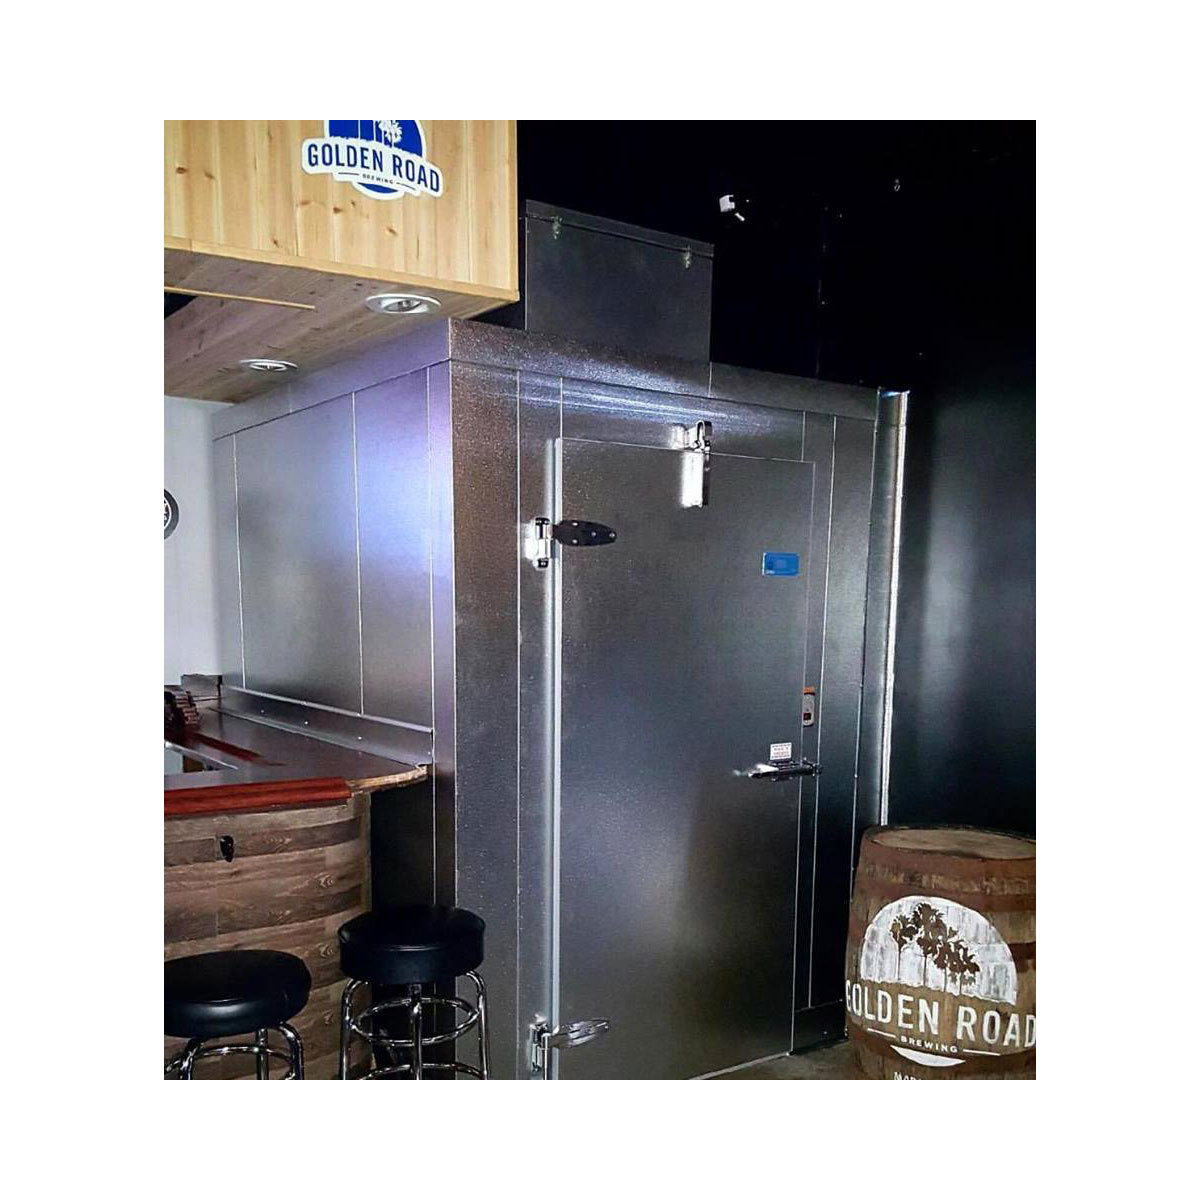 Cask & Hammer Walk-in Box La Habra Commercial Cooling Par Engineering Inc. City of Industry